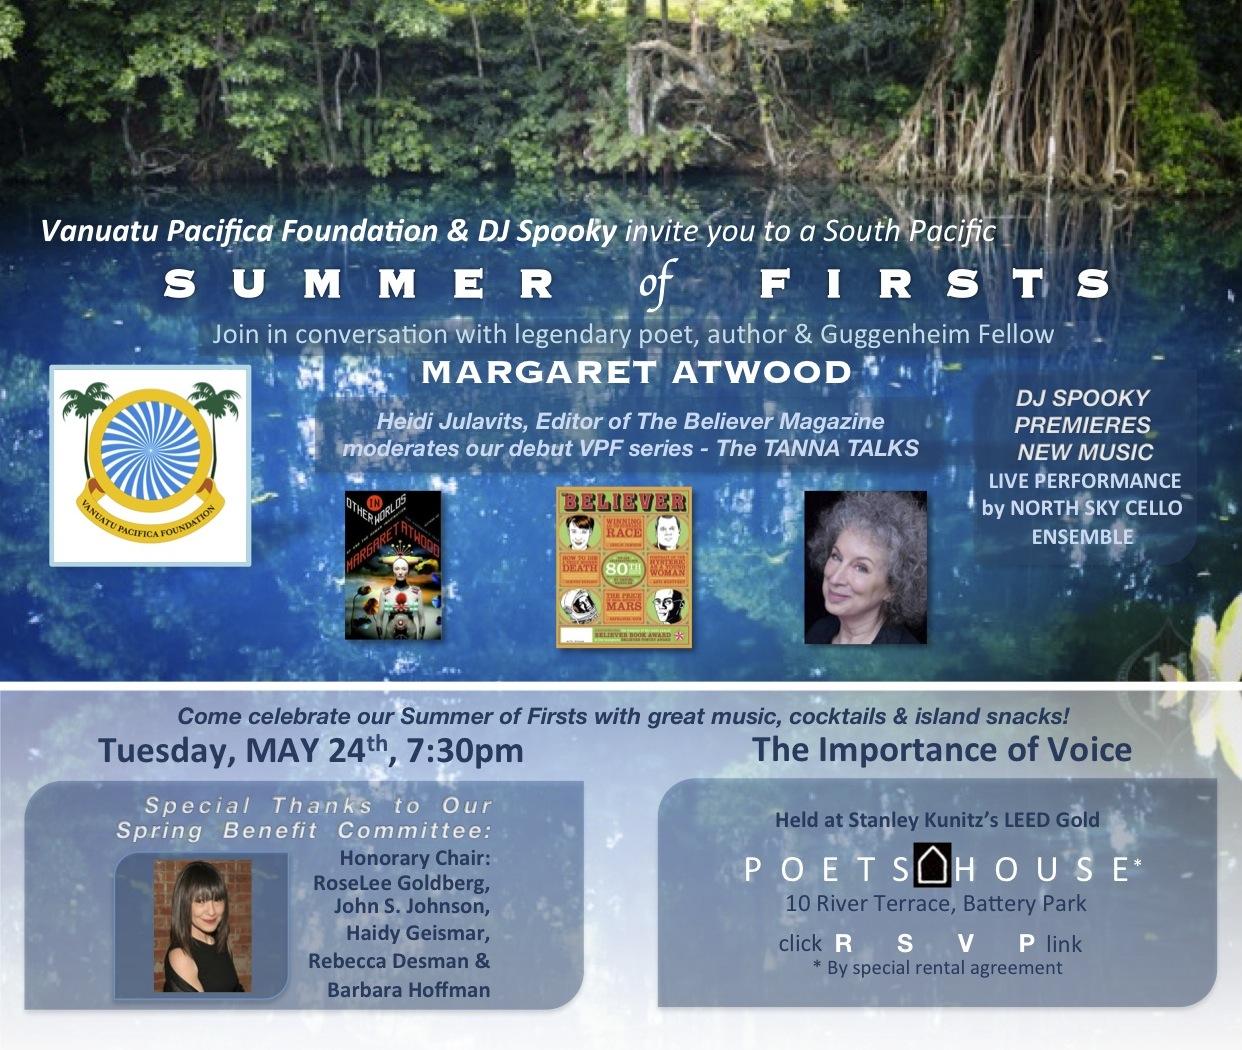 VPF Tanna Talks with Margaret Atwood invitation